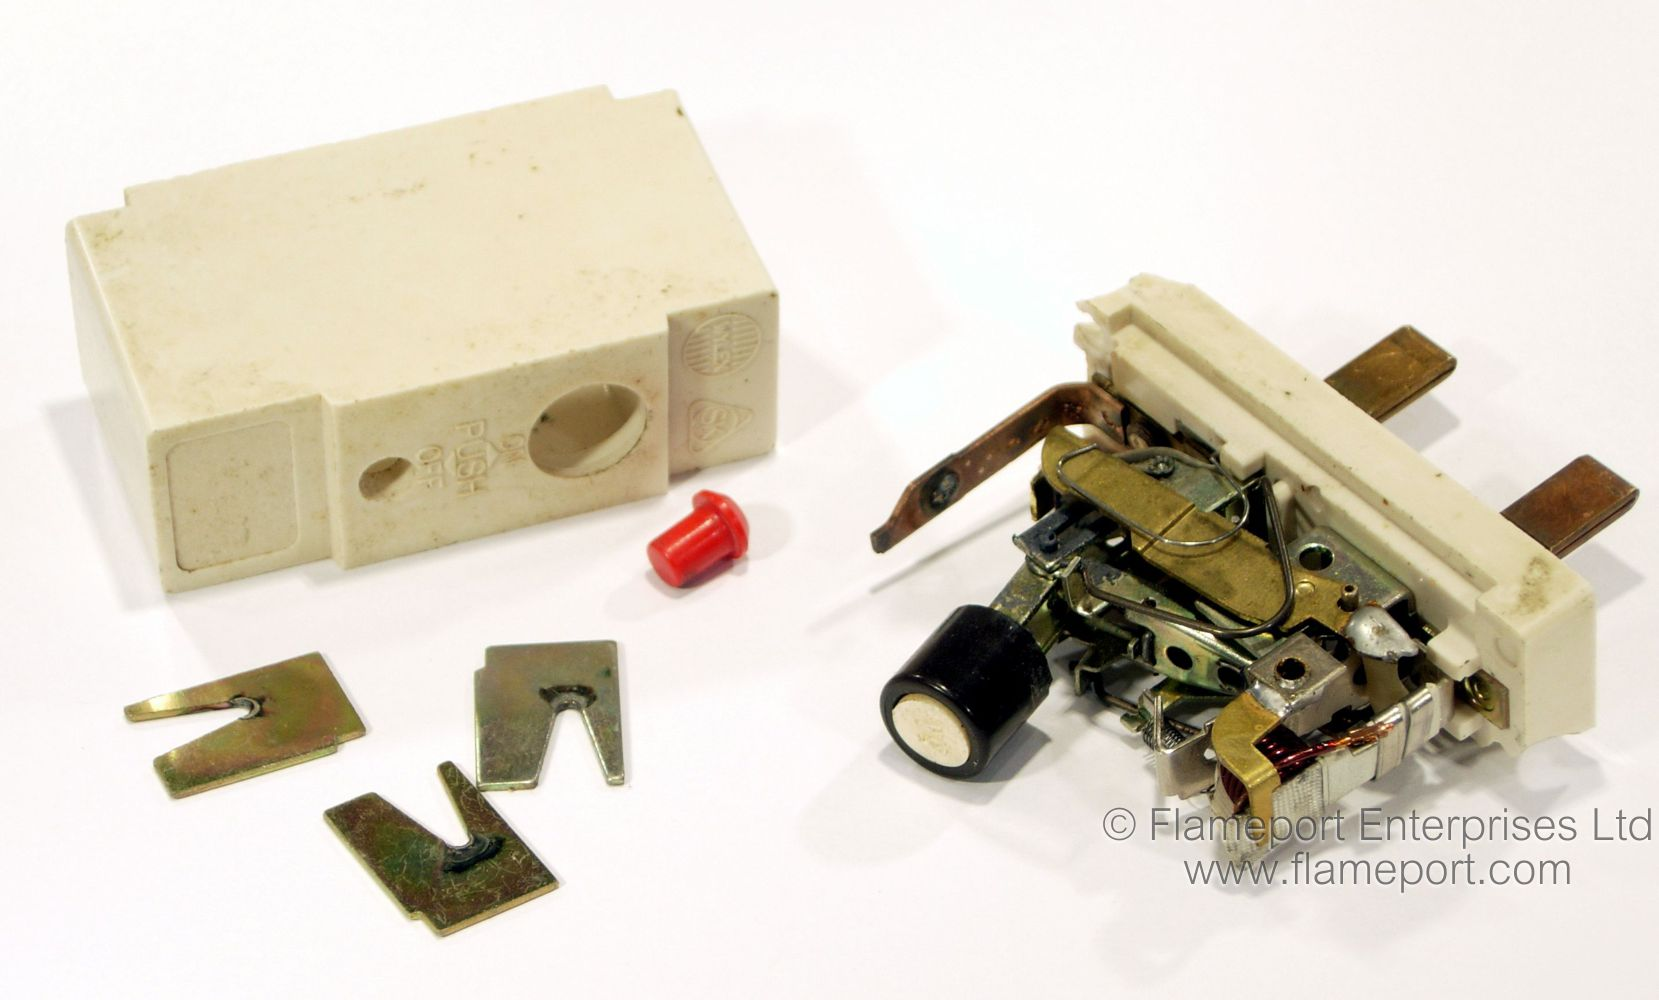 hight resolution of components of a wylex branded stotz kontakt miniature circuit breaker